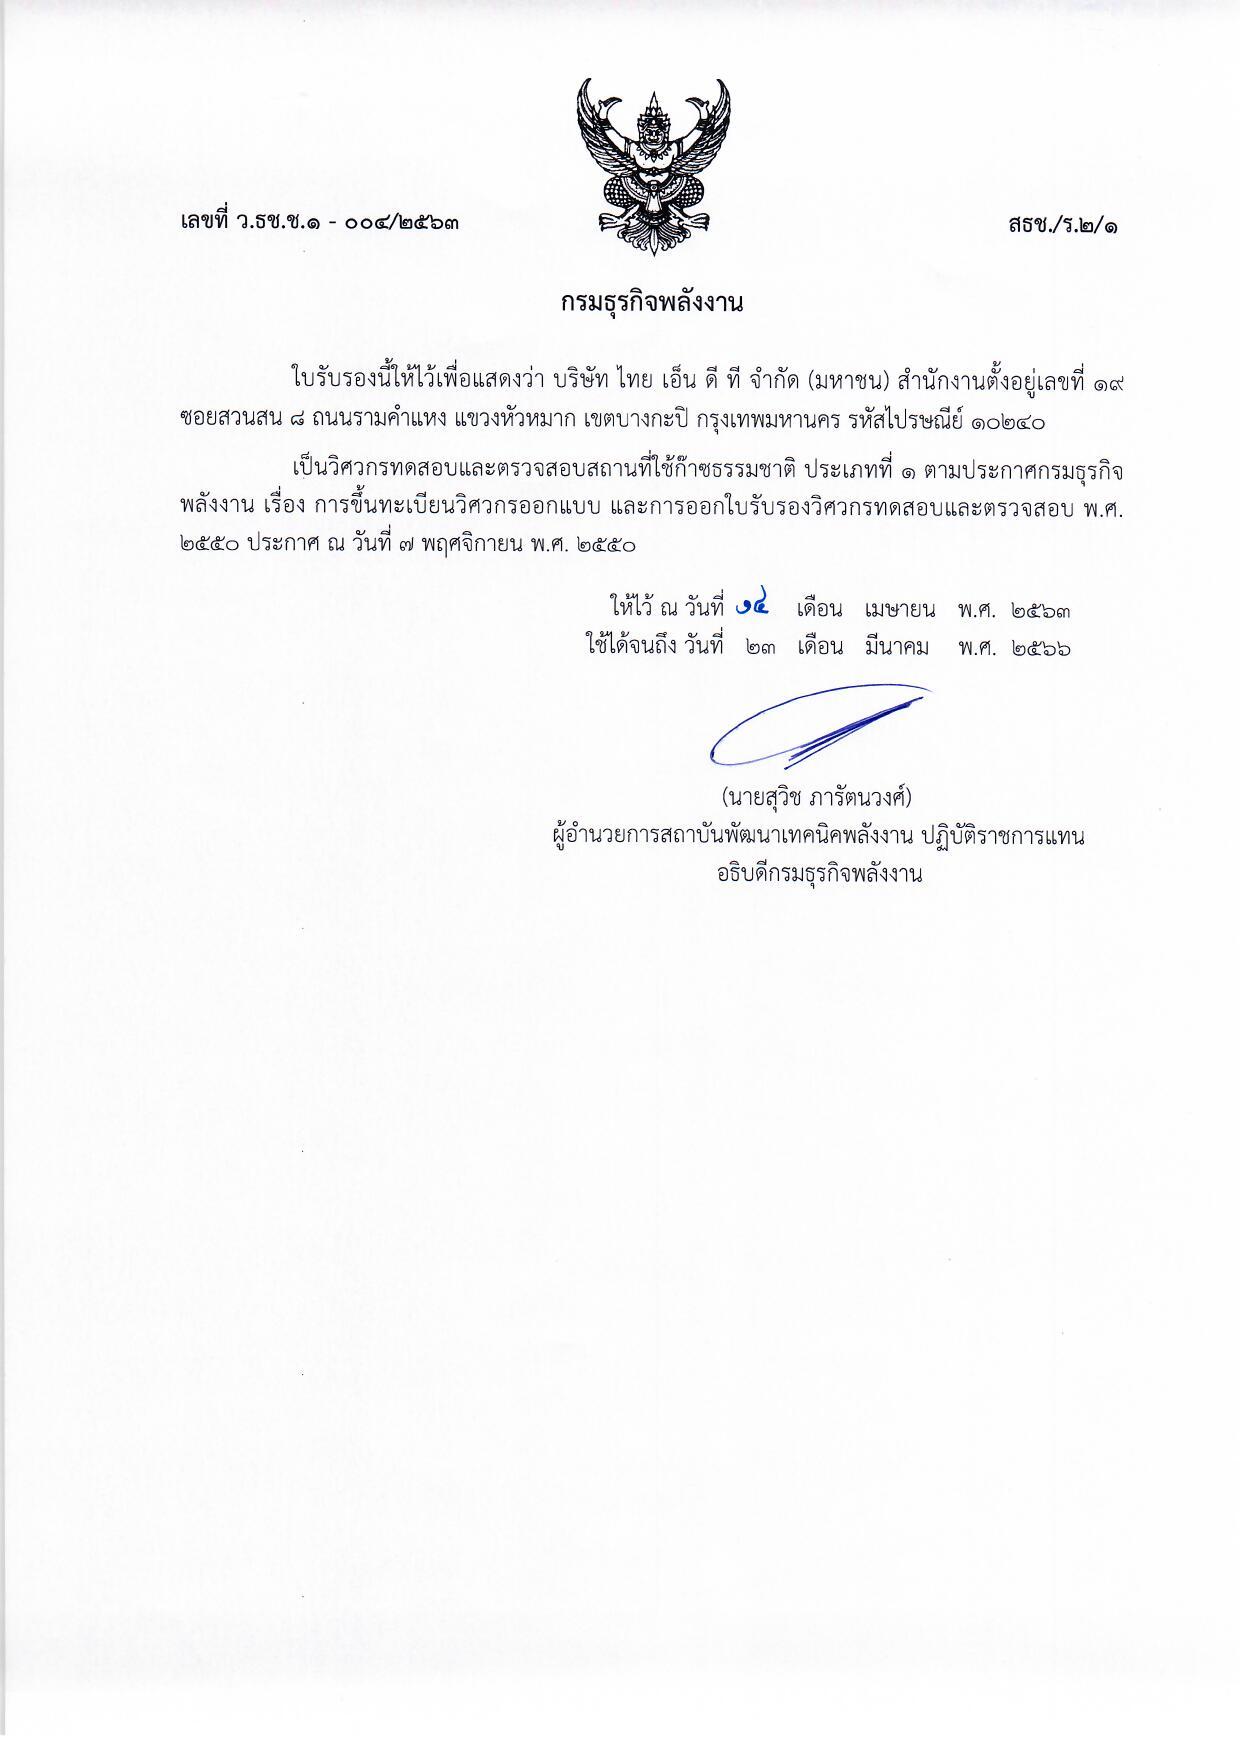 Certificates of DOEB